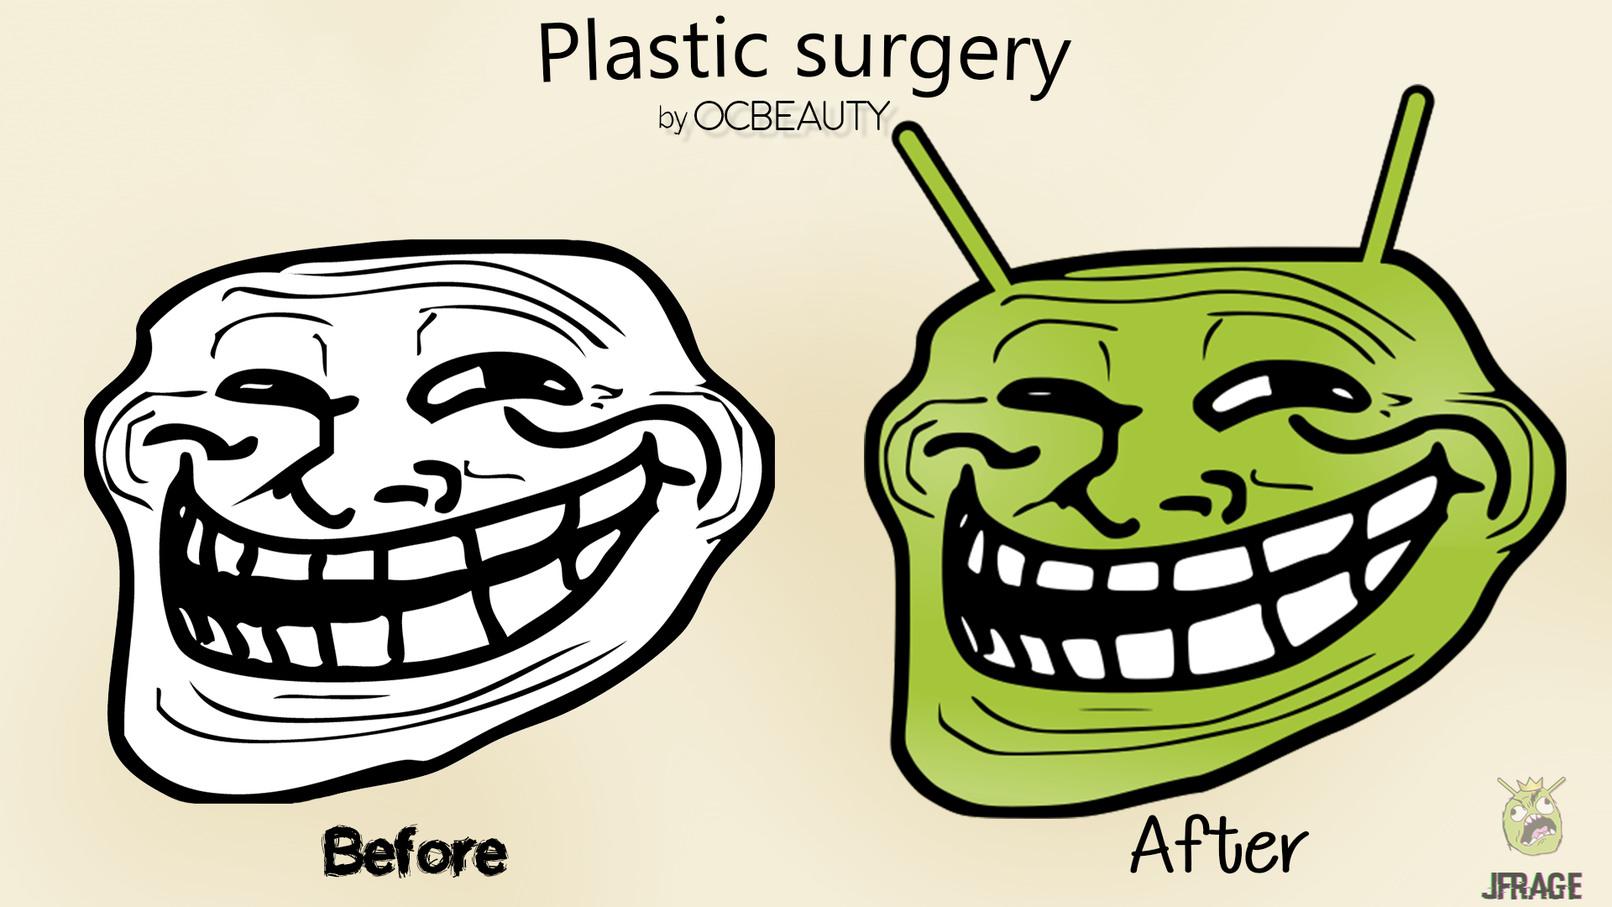 Would you do Plastic Surj138ery? - meme